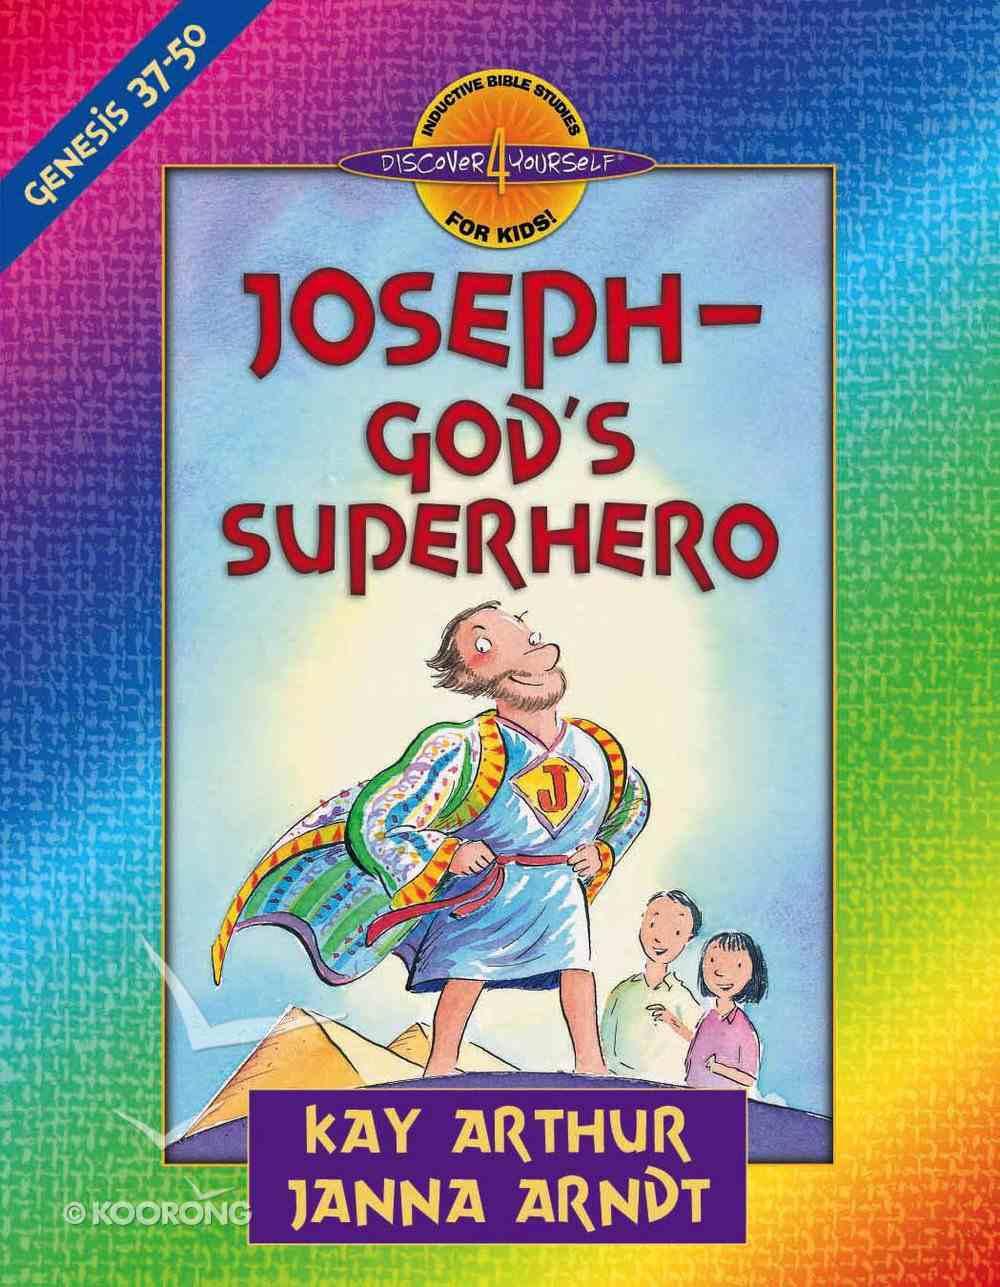 Joseph - God's Superhero (Genesis 37-50) (Discover For Yourself Bible Studies Series) eBook